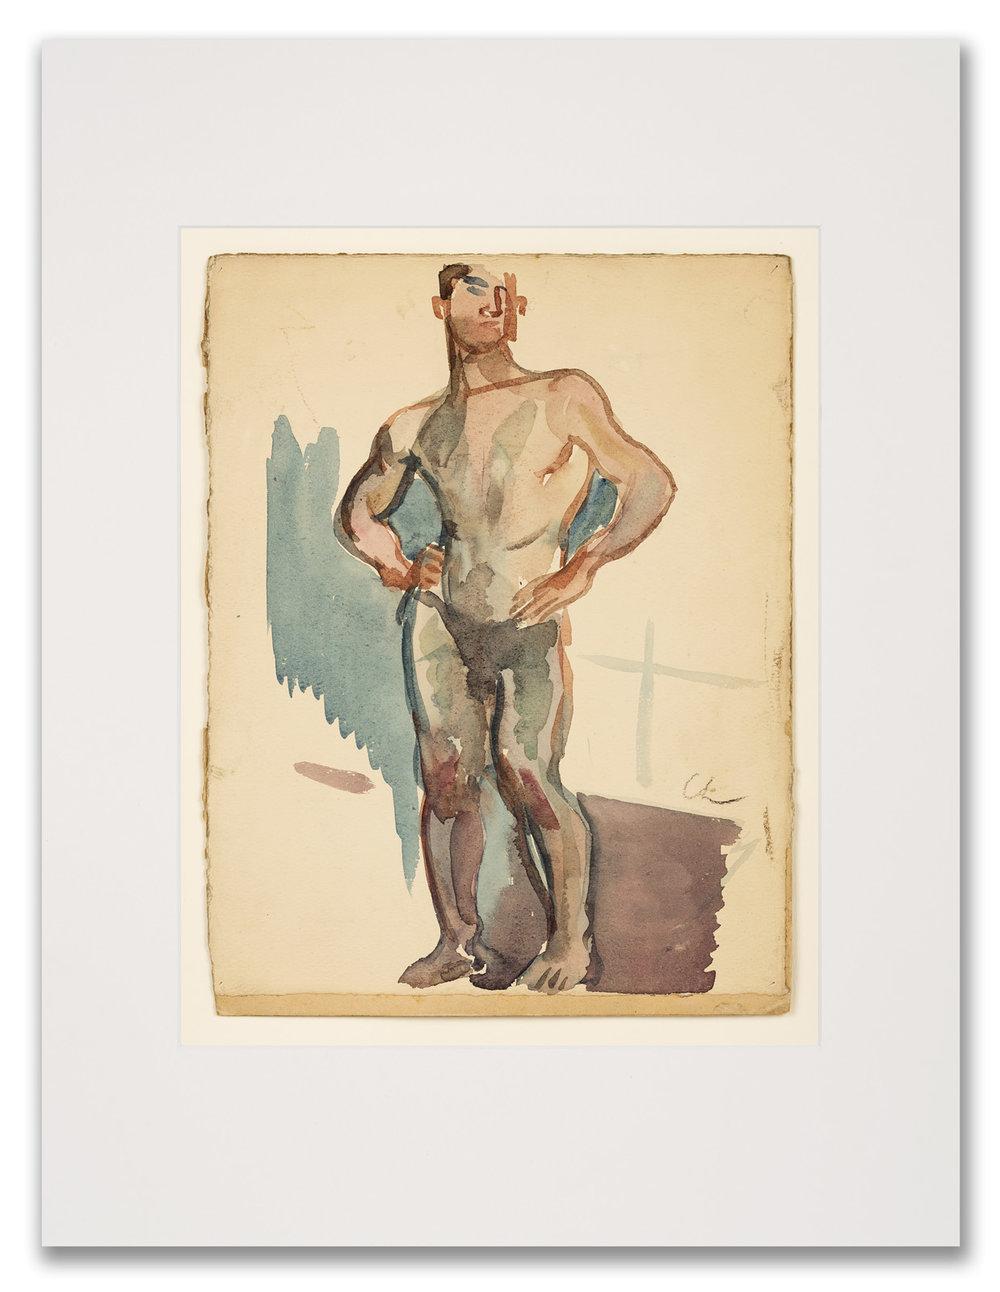 Serge Choubine, (Russian c.1900-1931), Male Figure, 20th Century.